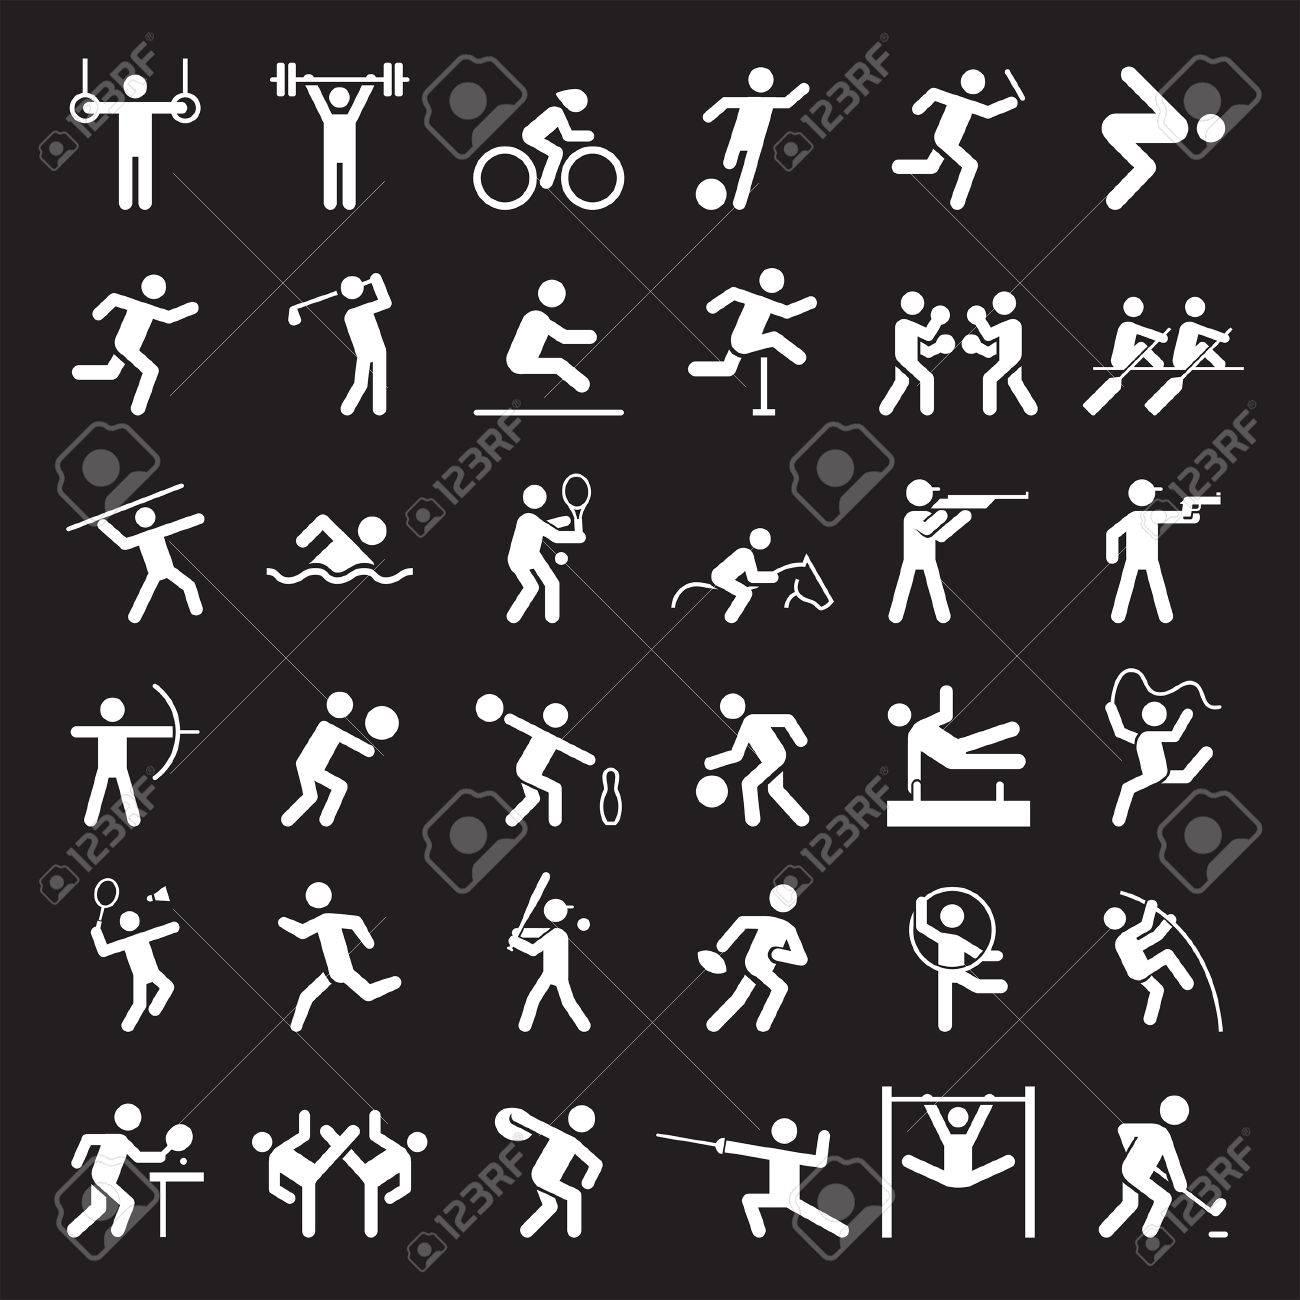 Set of sport icons. illustration. - 57844712